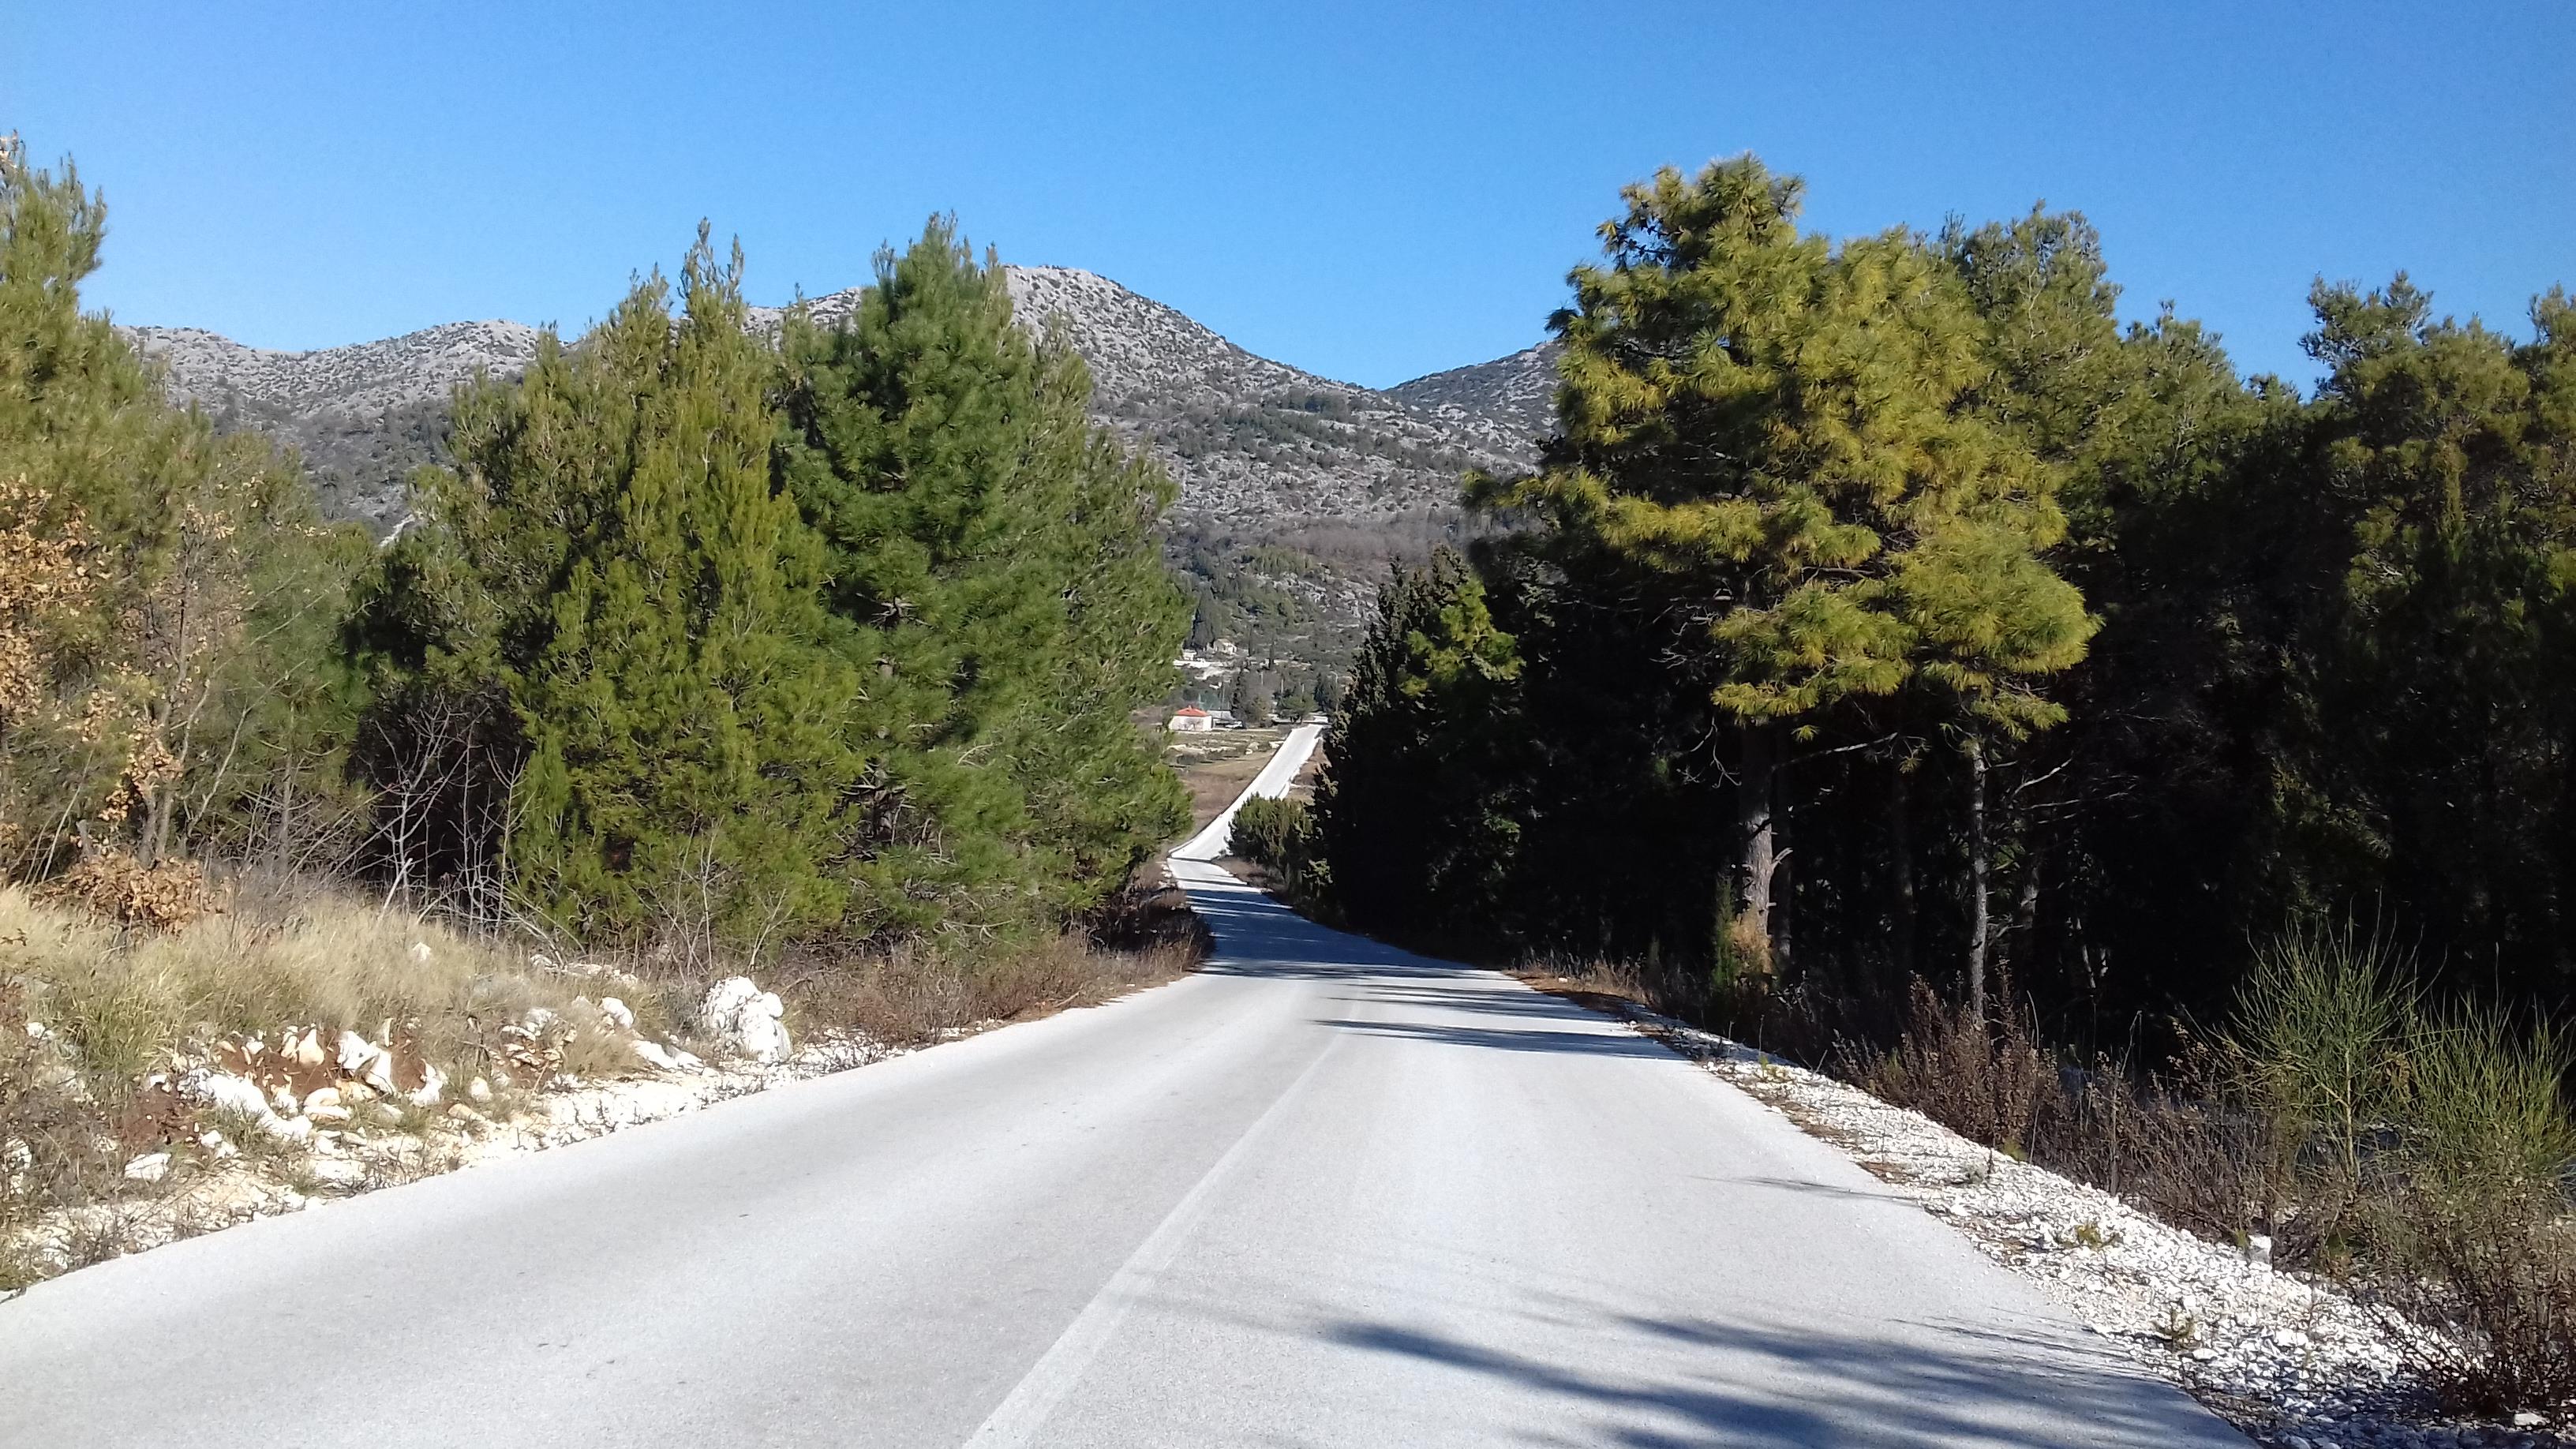 Izvedena lokalna cesta 69032